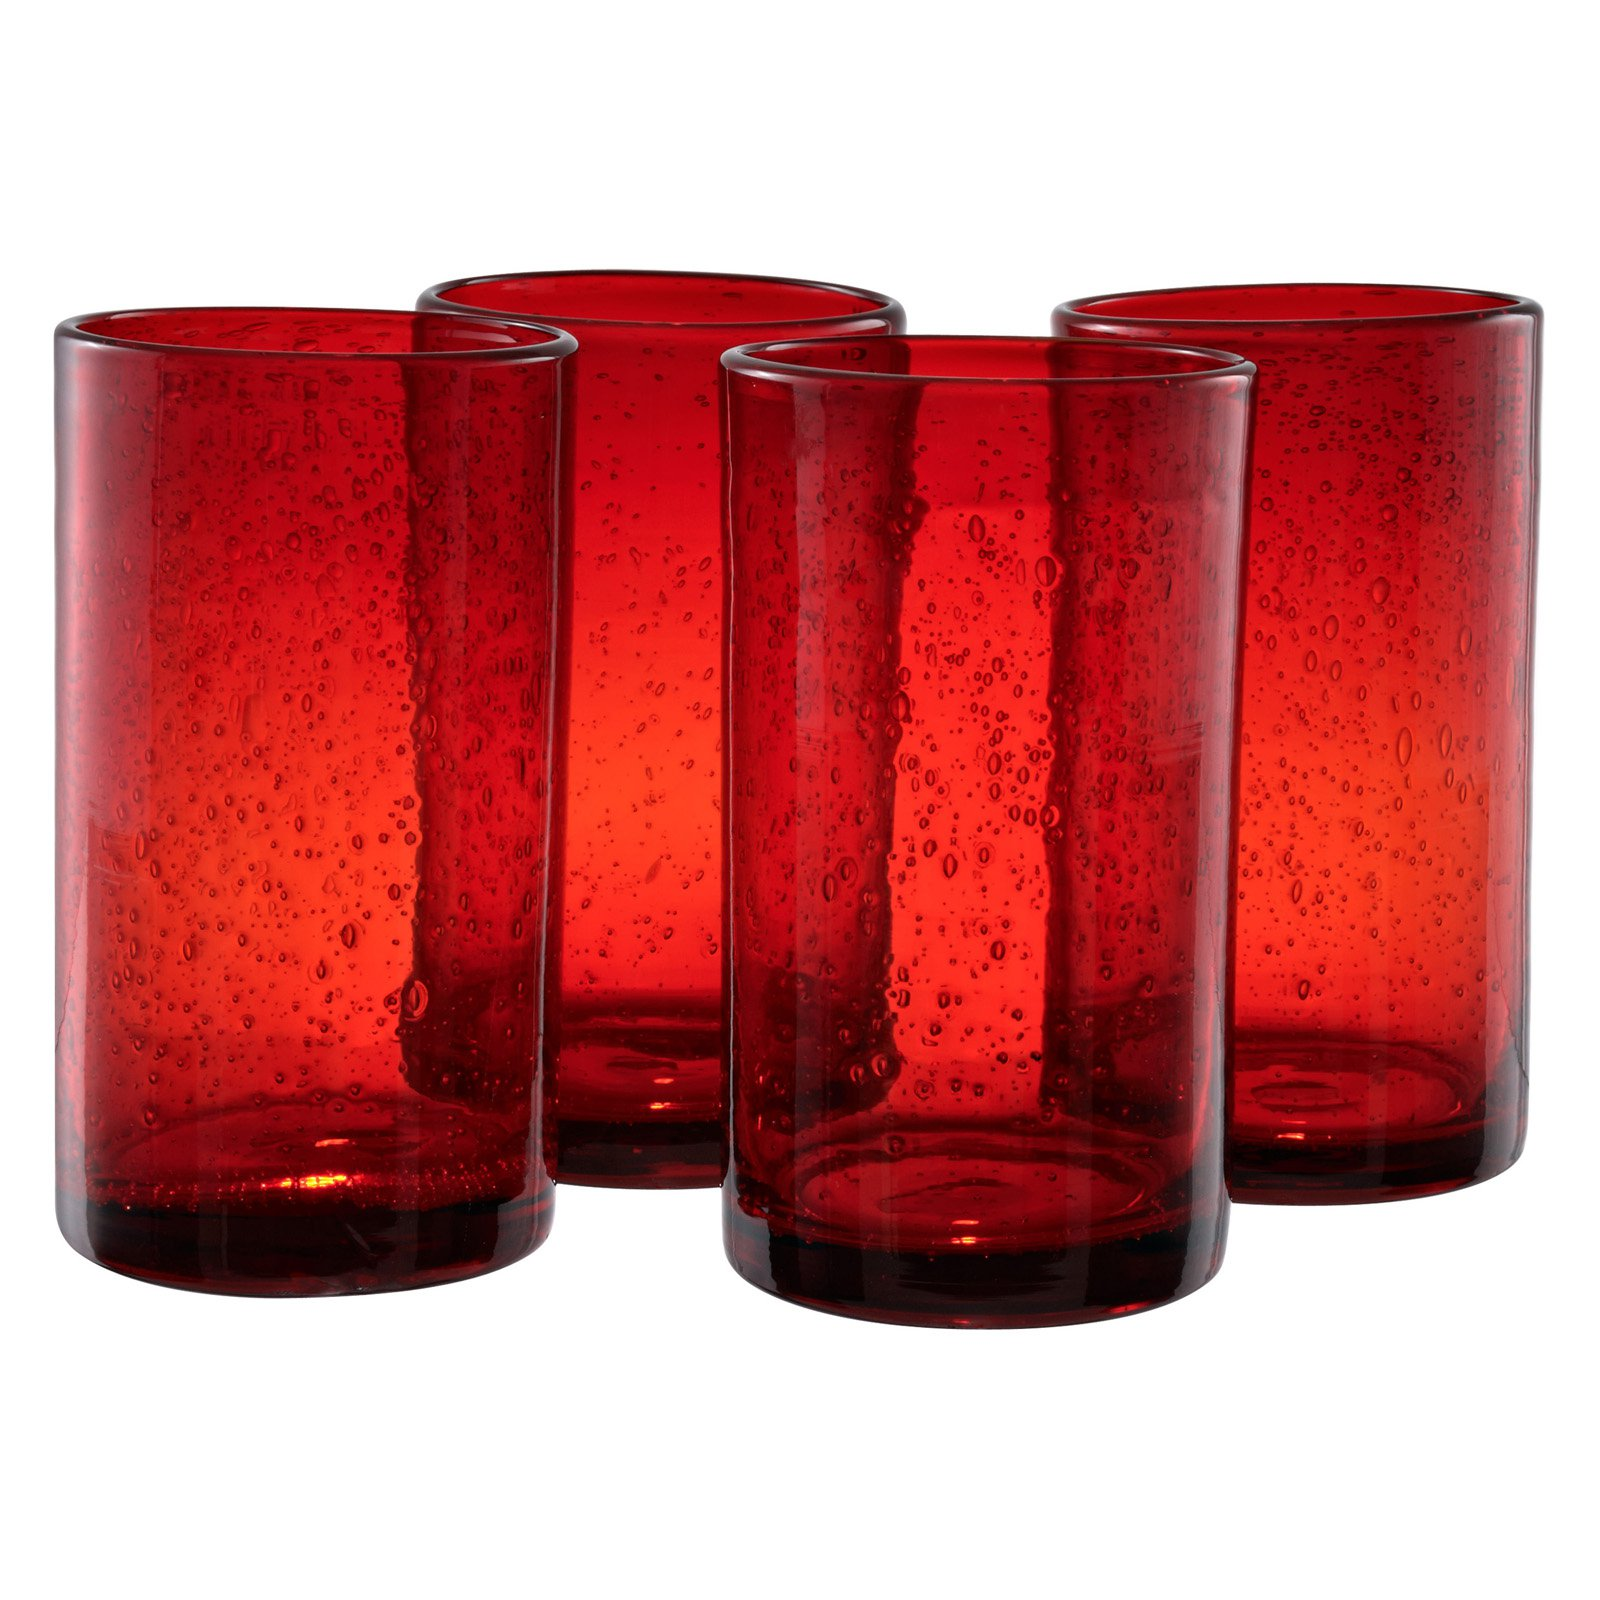 Artland Inc. Iris Ruby HiBall Glasses - Set of 4